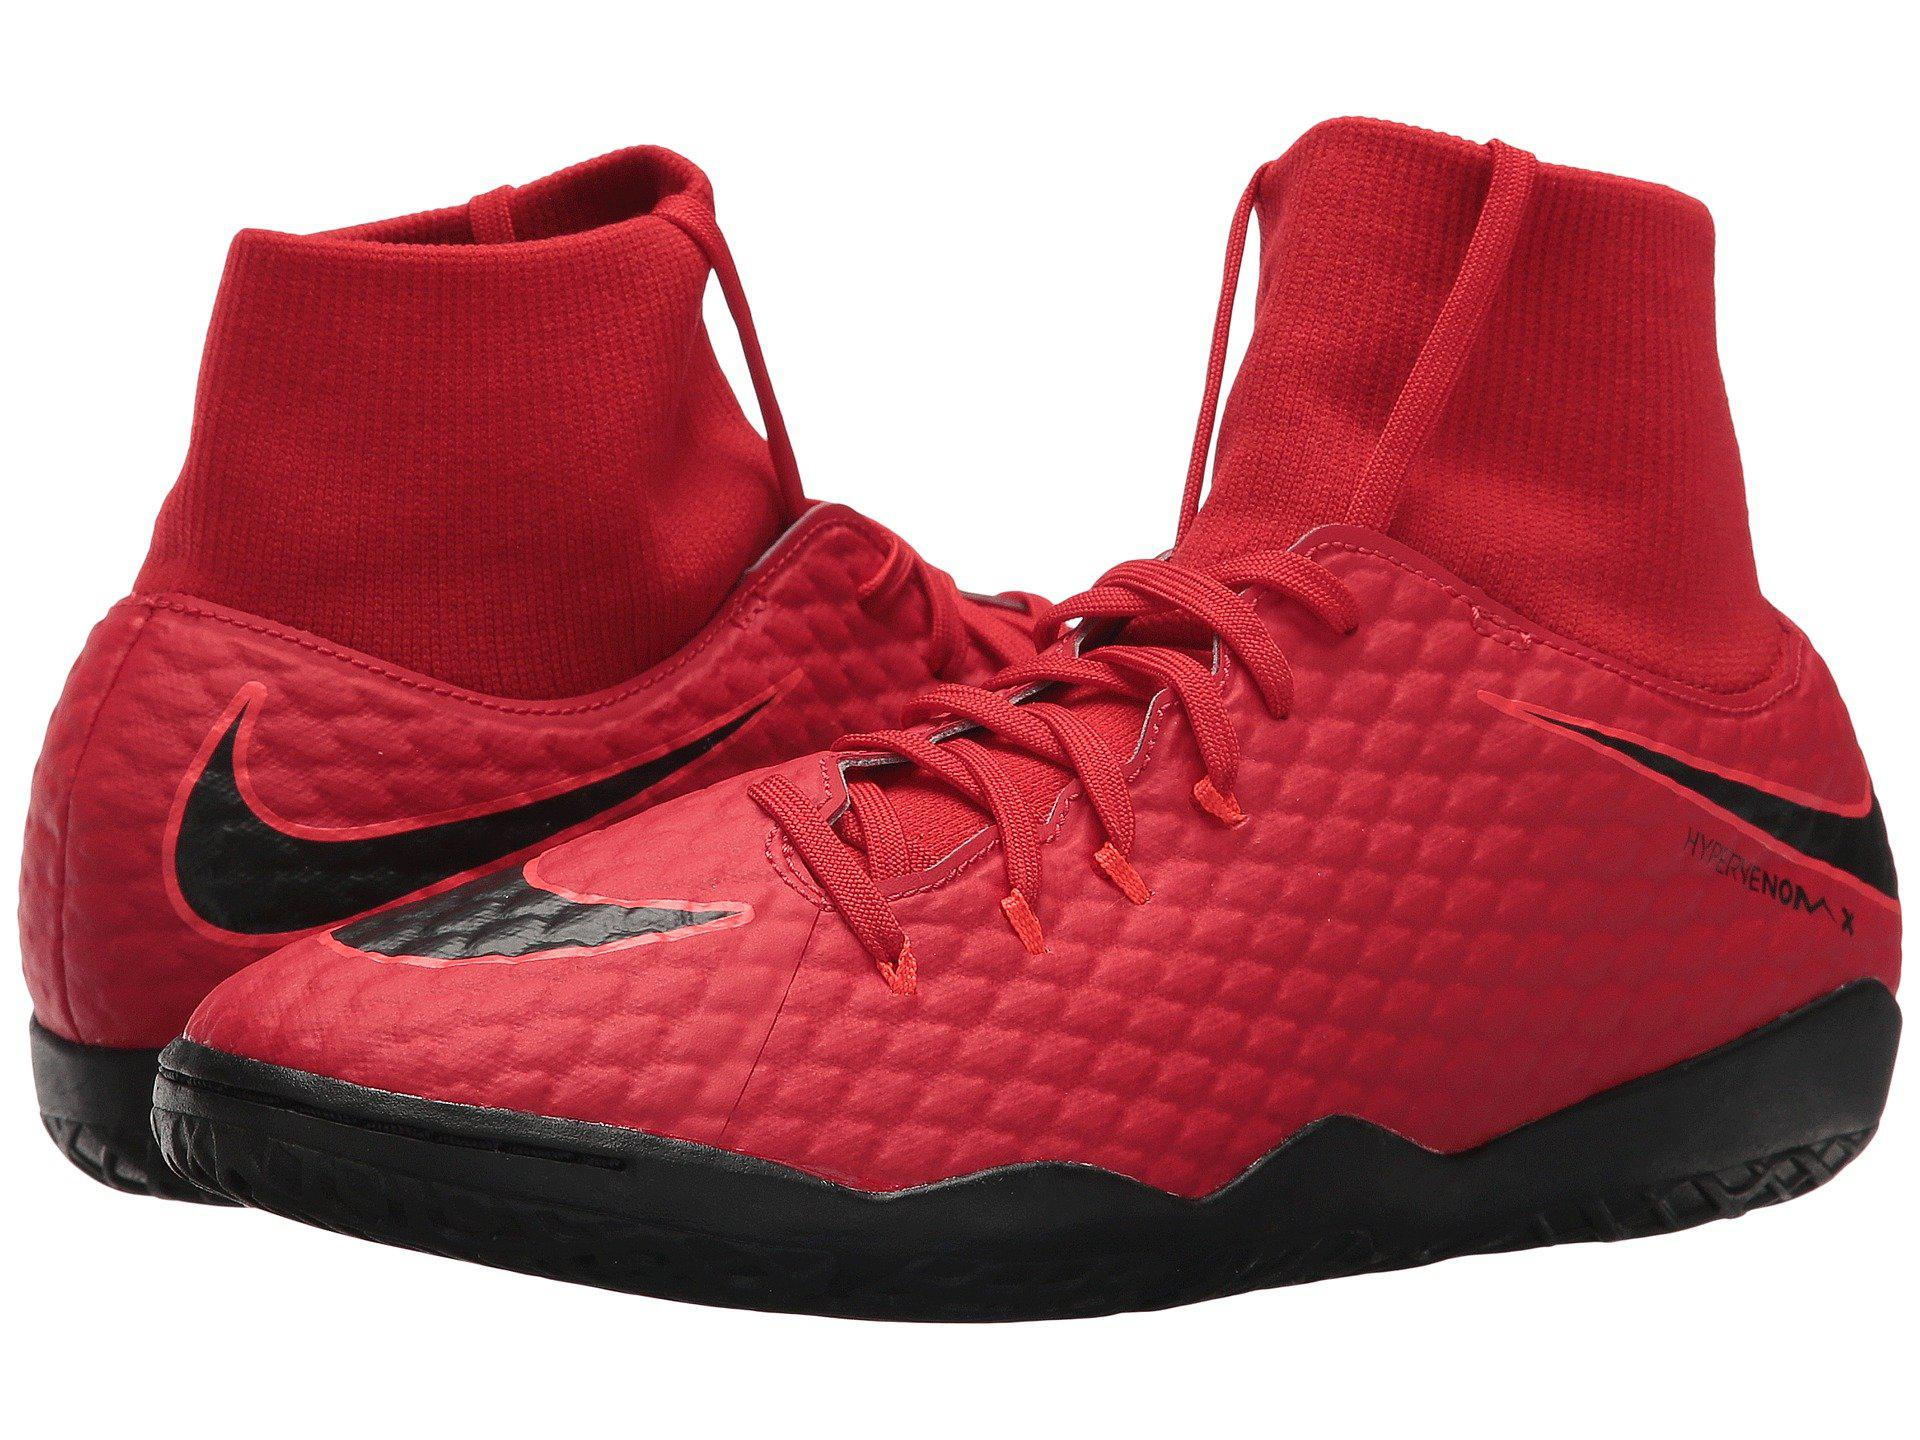 b231690d3d2 Nike - Red Hypervenomx Phelon Iii Dynamic Fit Ic for Men - Lyst. View  fullscreen